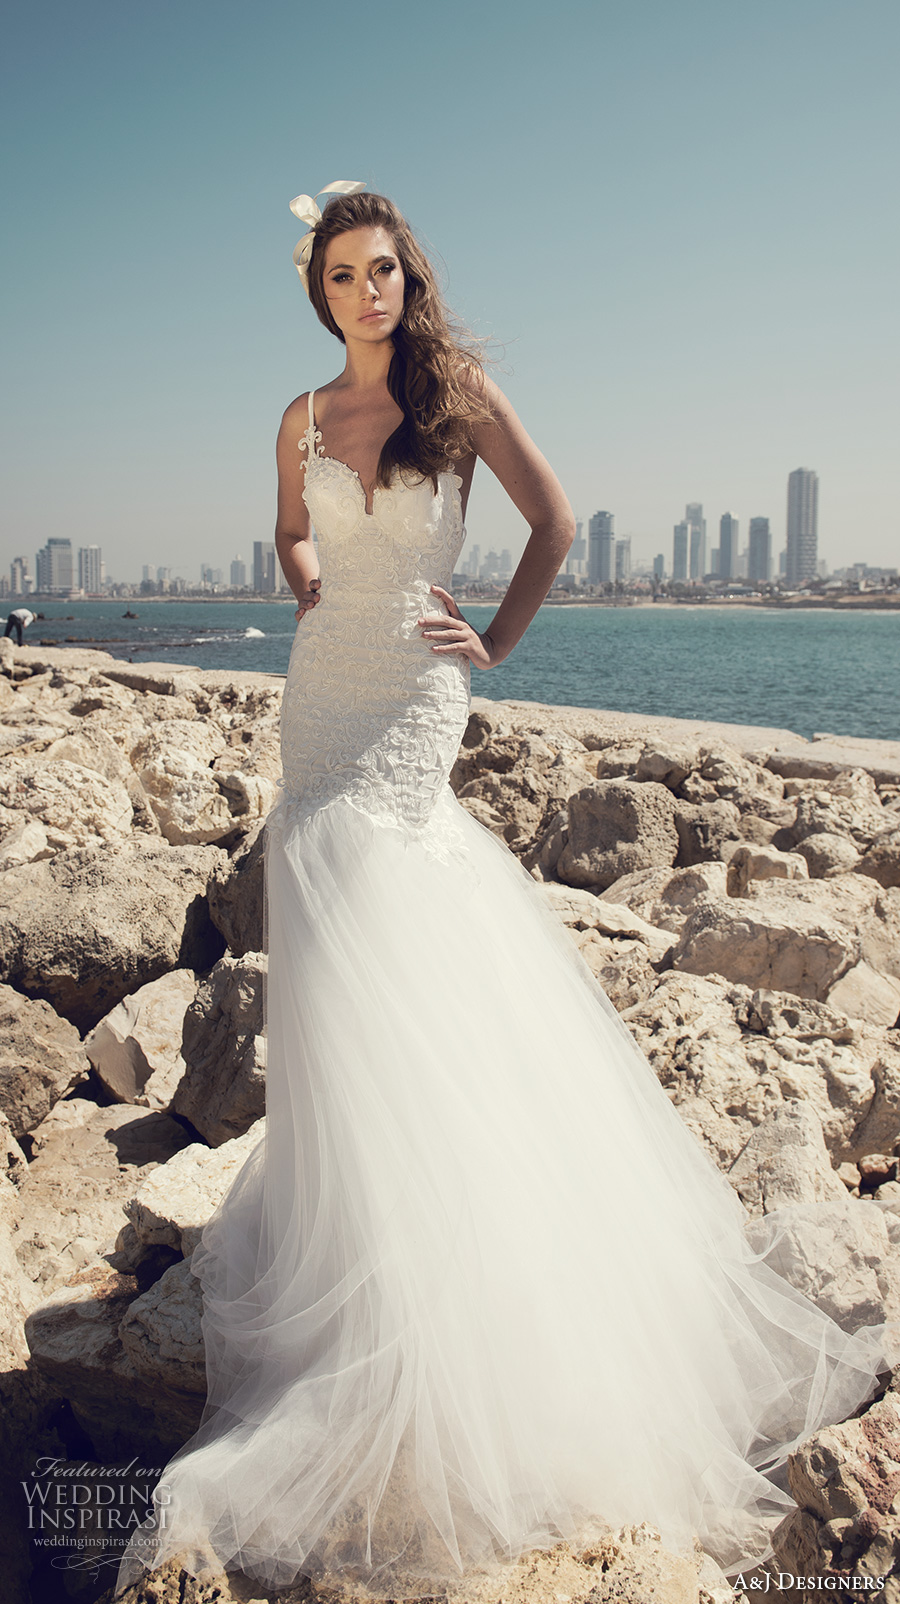 A j designers 2017 wedding dresses wedding inspirasi for Sexy designer wedding dresses